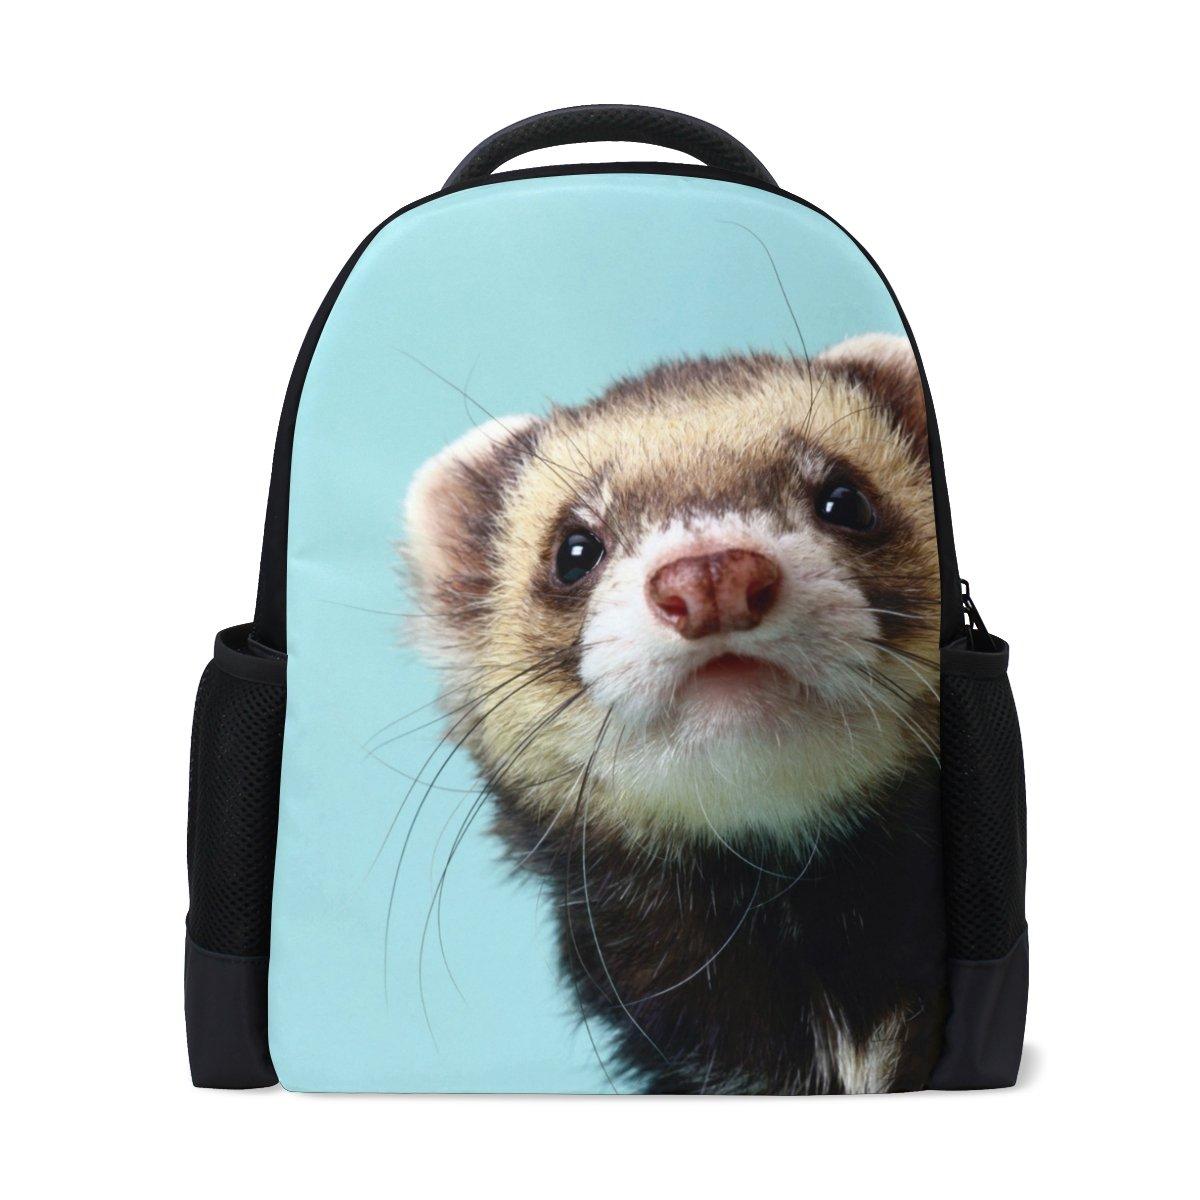 Lovely Ferret Faceバックパックスクールバッグ軽量Book Bags Ruchsack Collegeバックパックデイパック学生ガールズ/Boys   B07FRZVN11